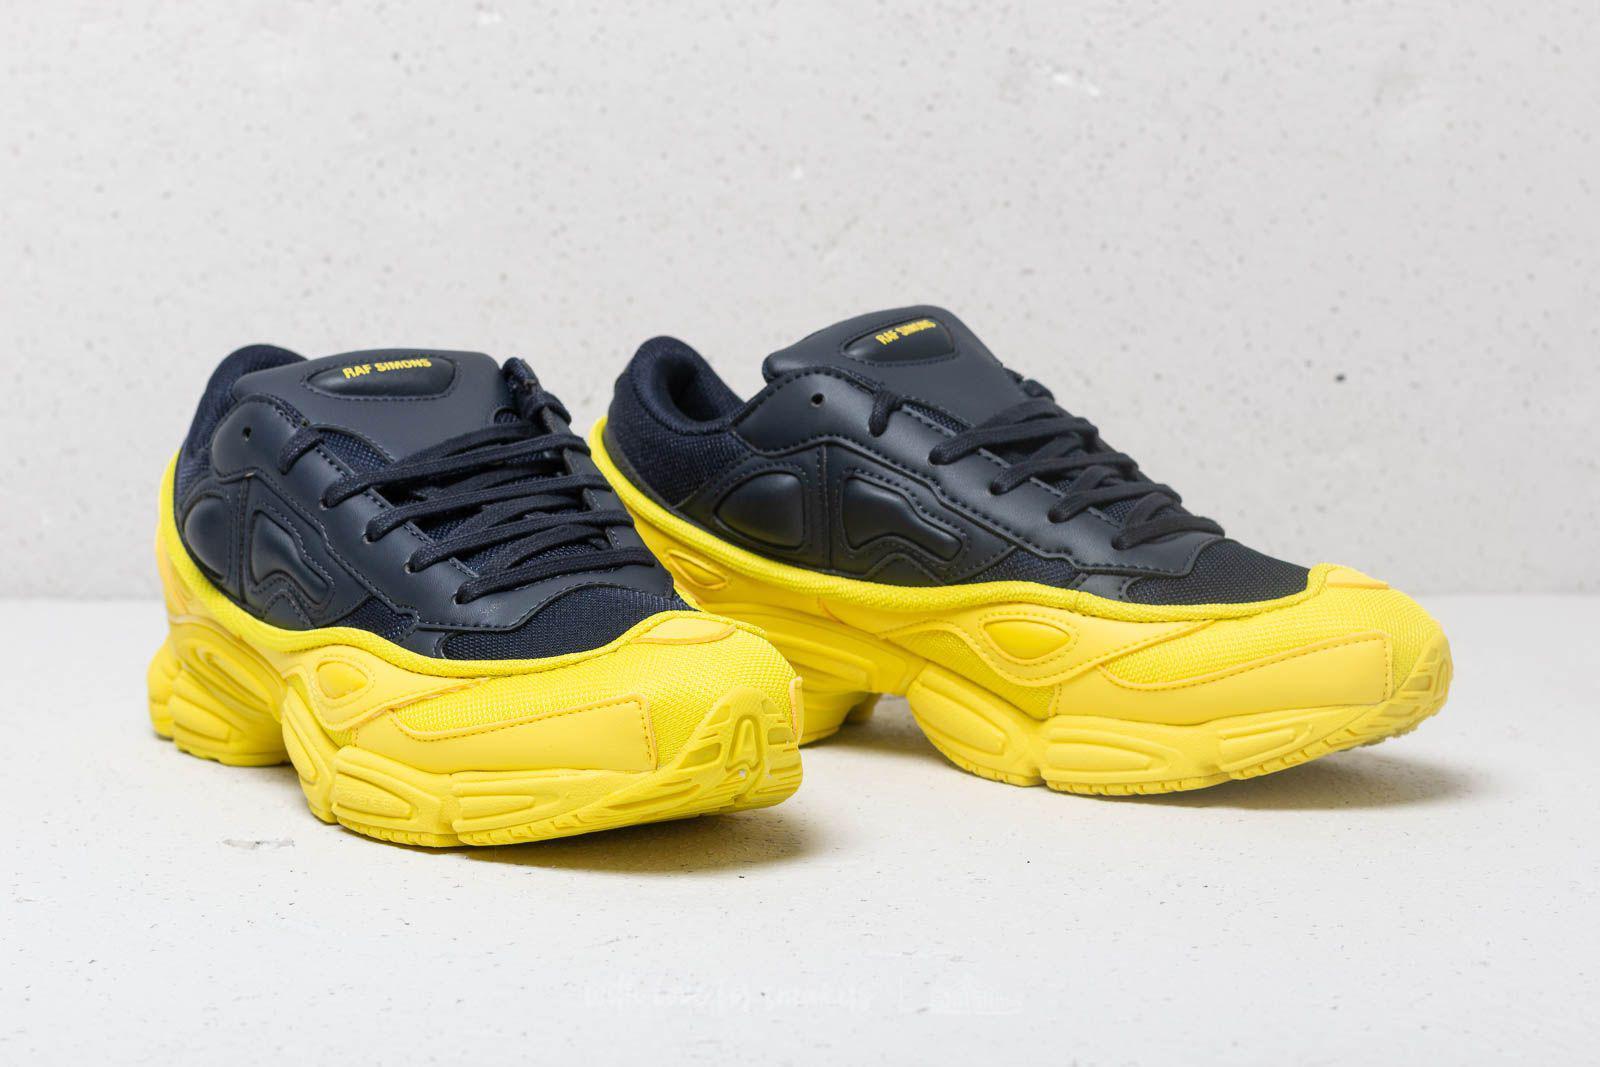 low priced 456ea 6c47e Lyst - adidas By Raf Simons Adidas X Raf Simons Ozweego Brig